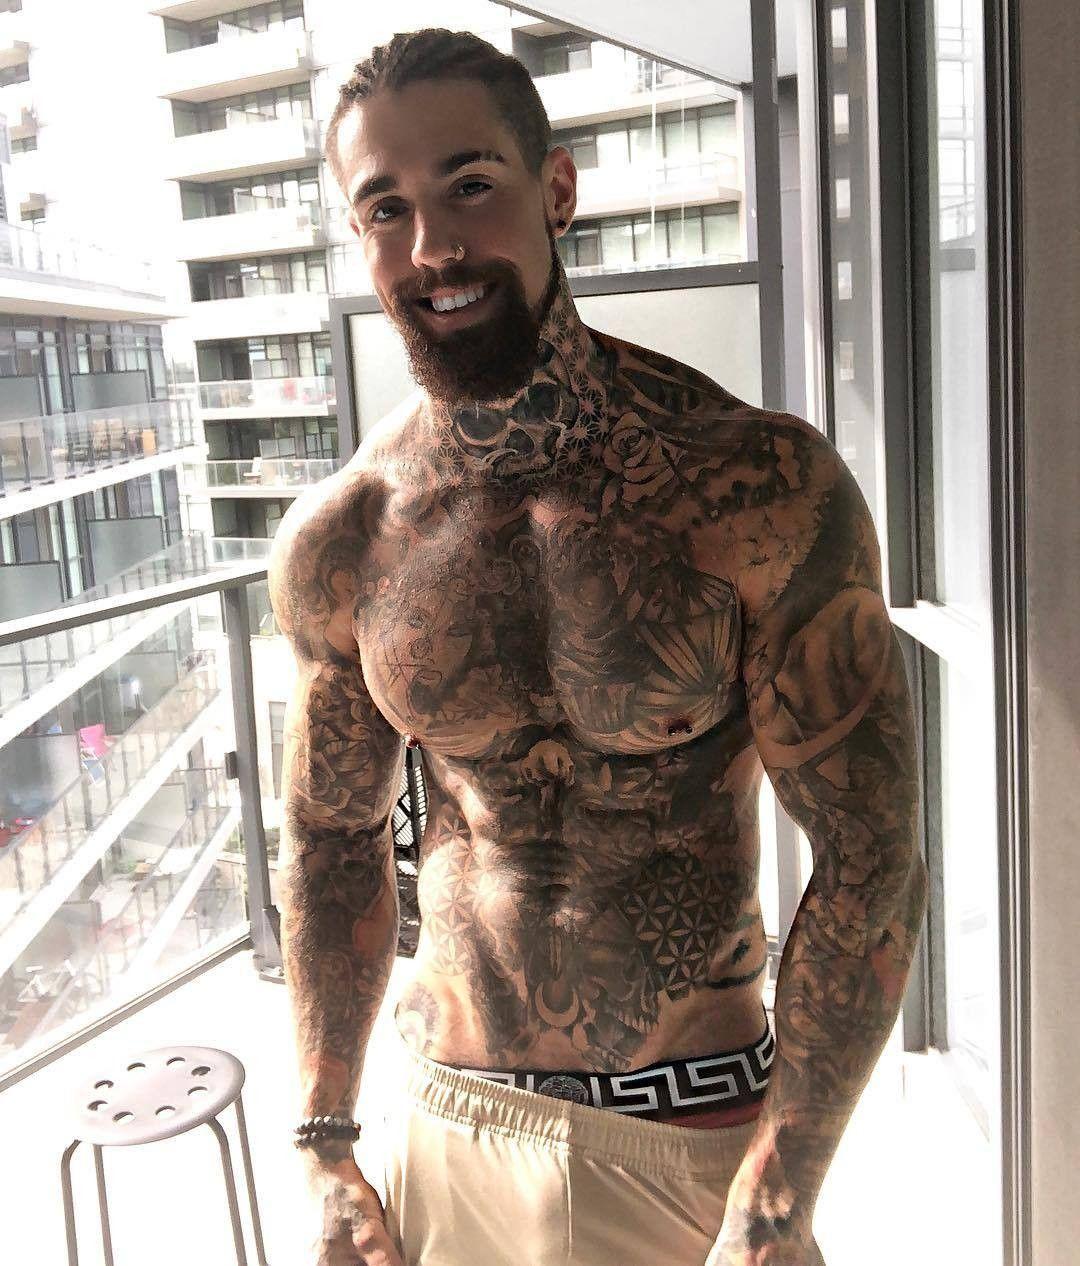 Barber gay tube